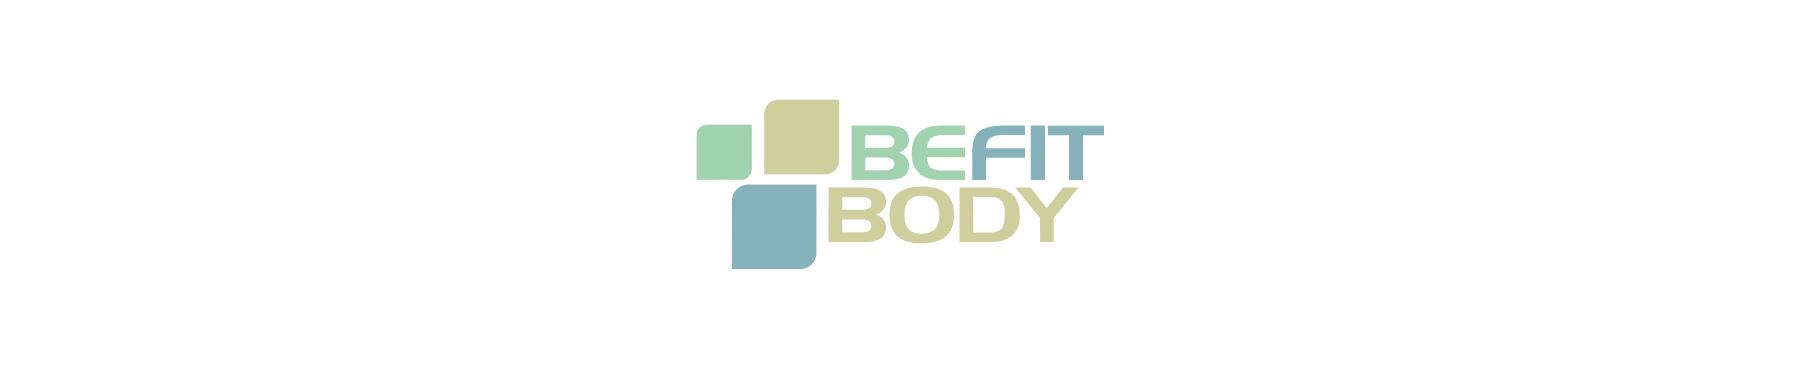 be fit body.jpg